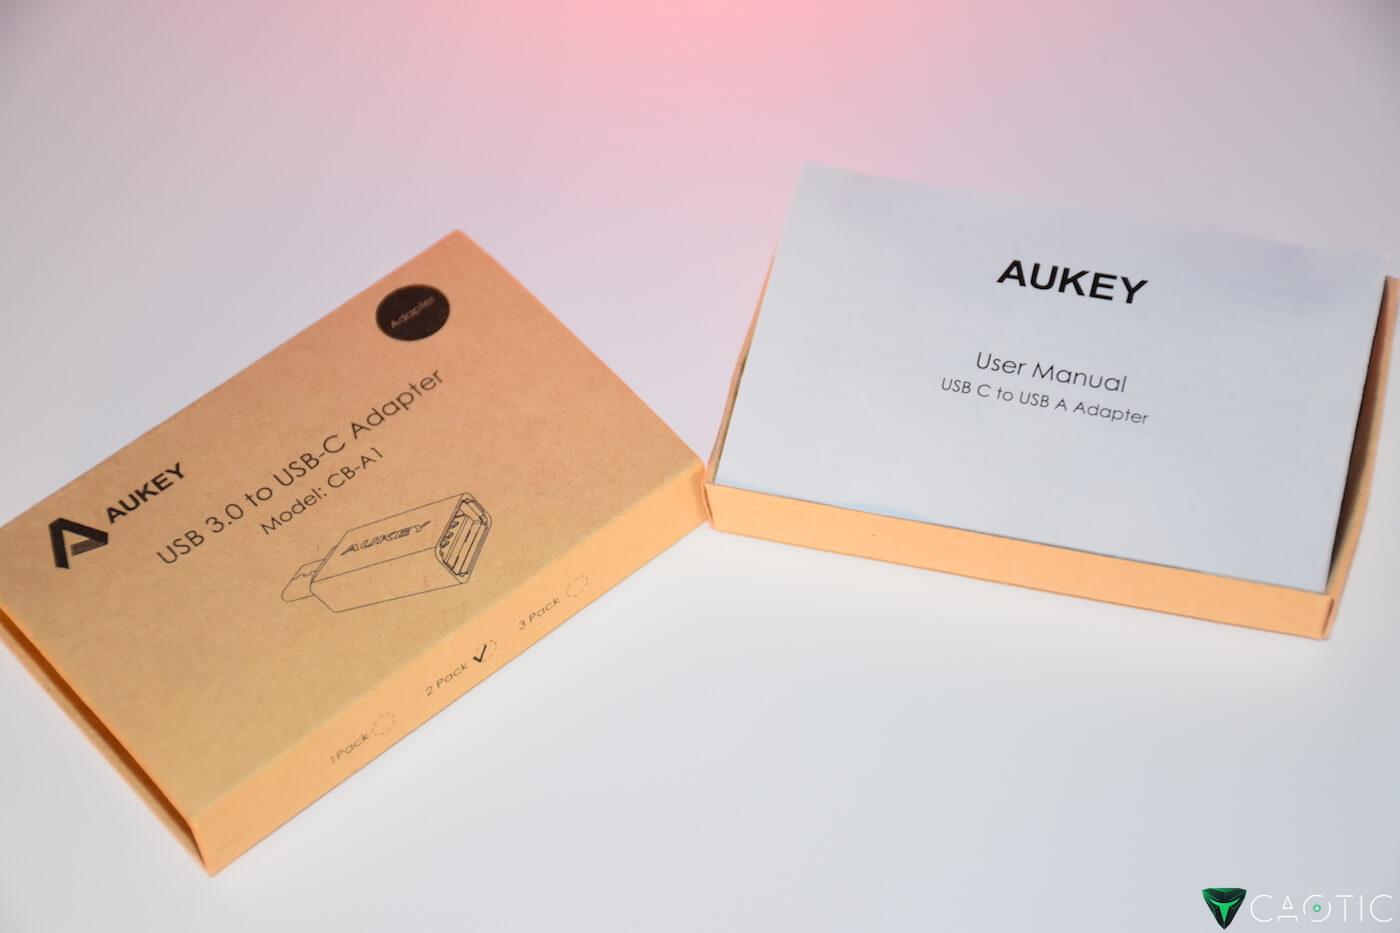 Adattatori Aukey